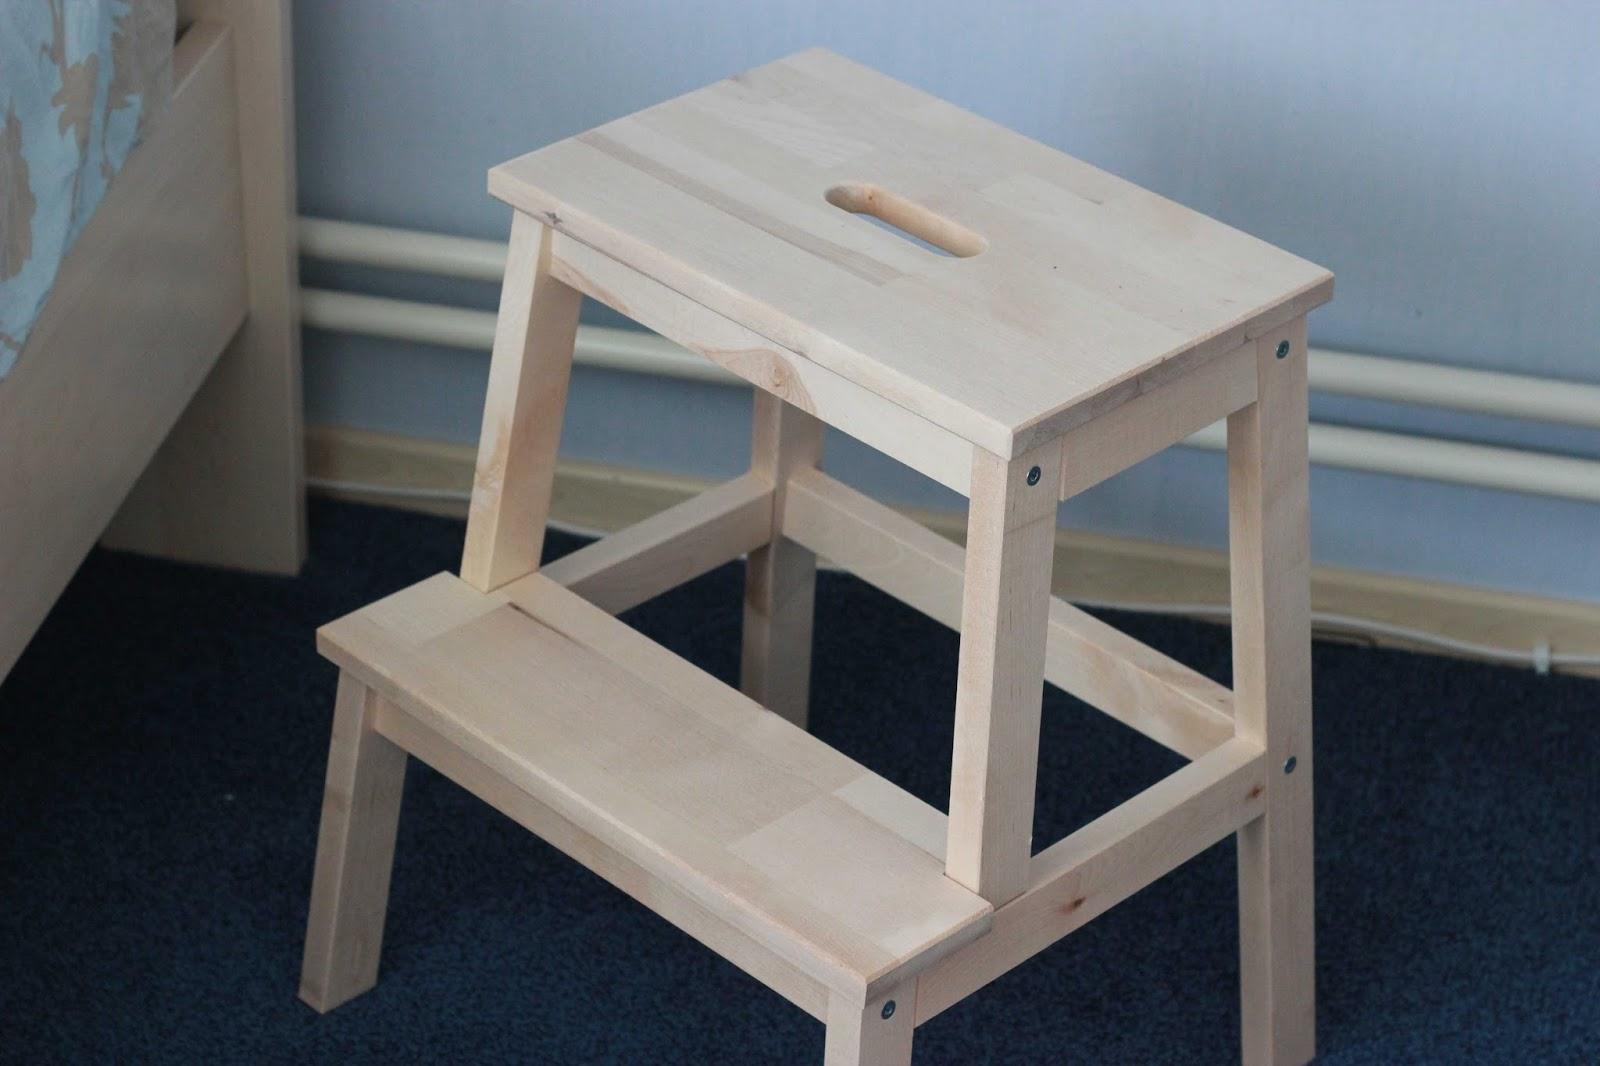 Ikea Glazen Tafel : Ikea eettafel hoogglans wit. witte houten tafel wit met houten blad